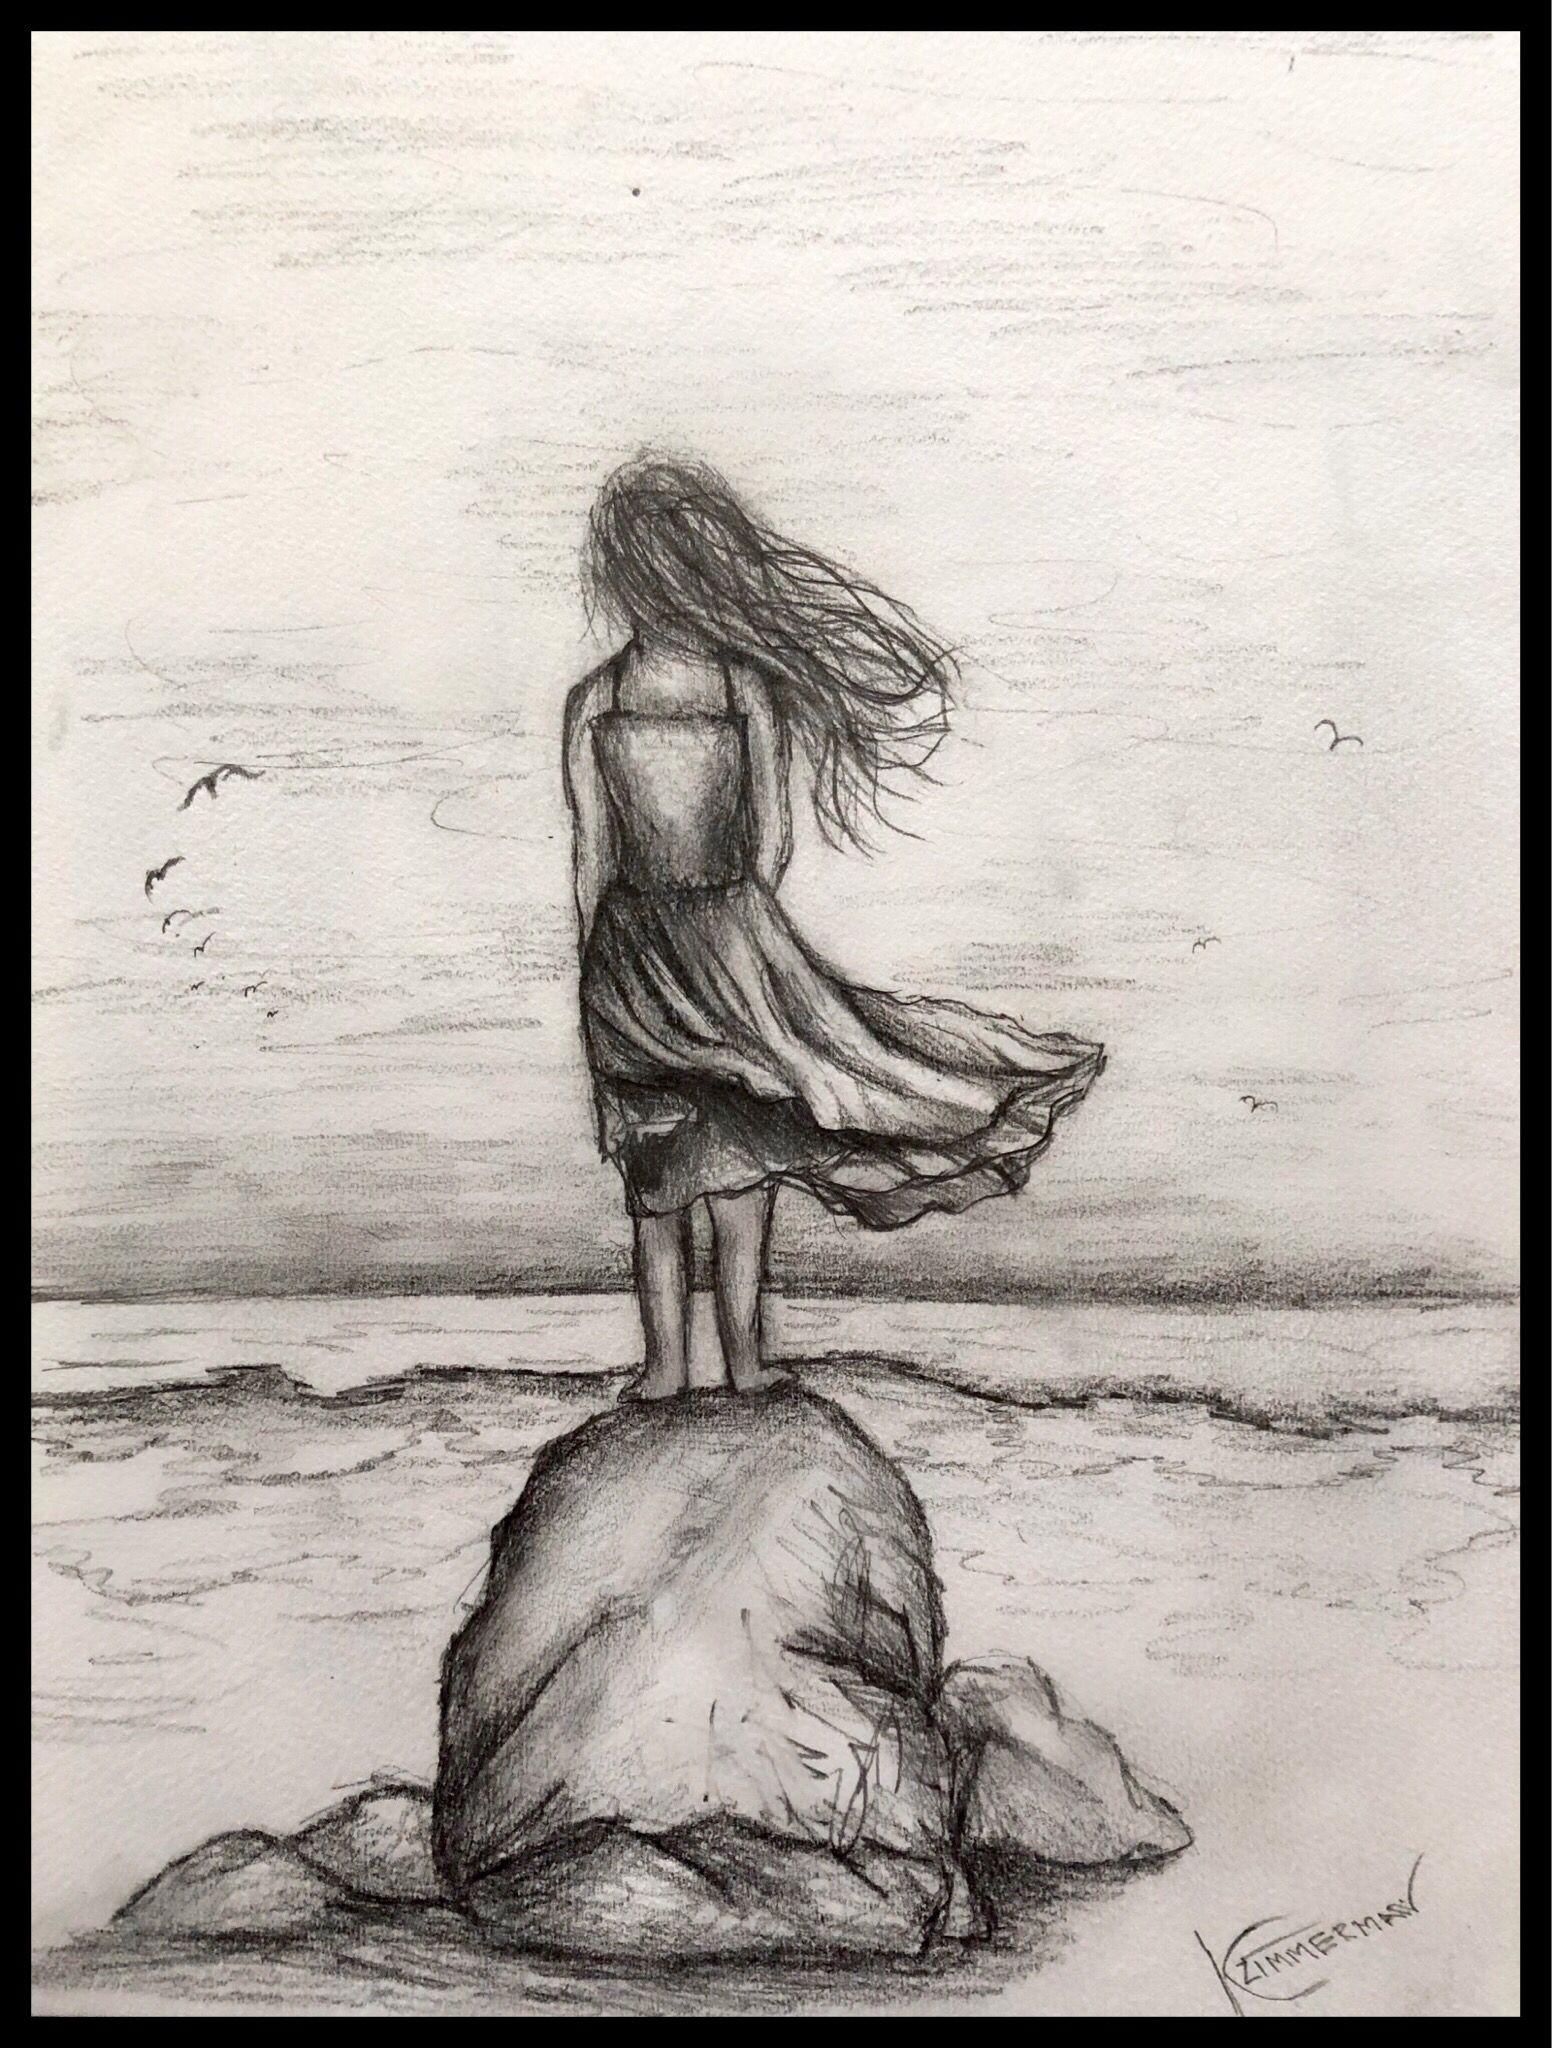 Van-Go Paint-By-Number Kit Standing Woman Watching the Ocean